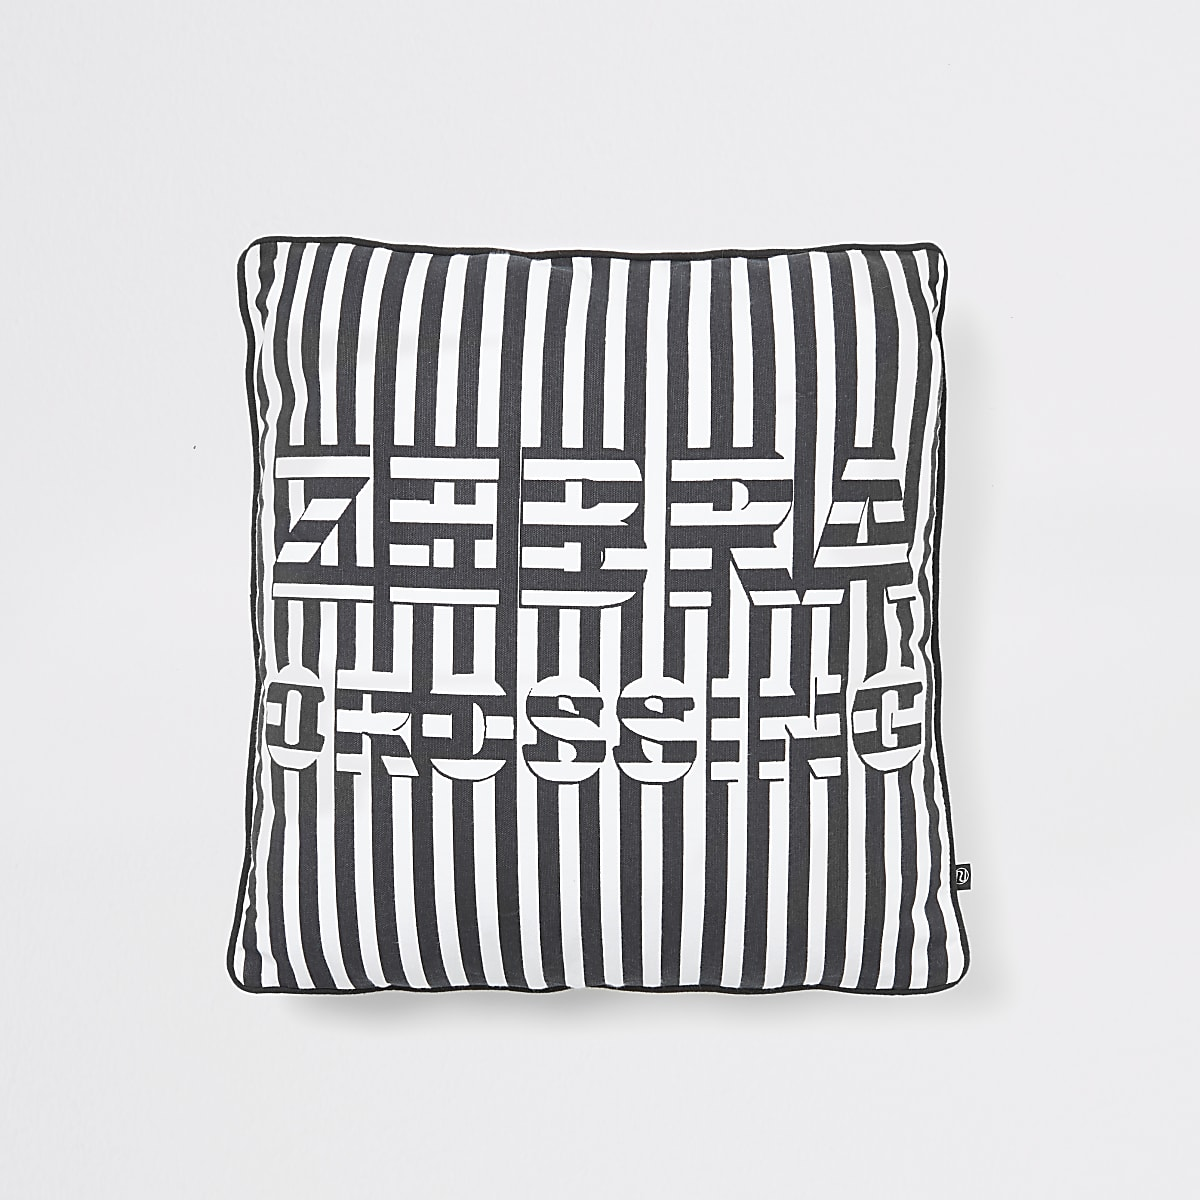 Black 'Zebra Crossing' slogan cushion